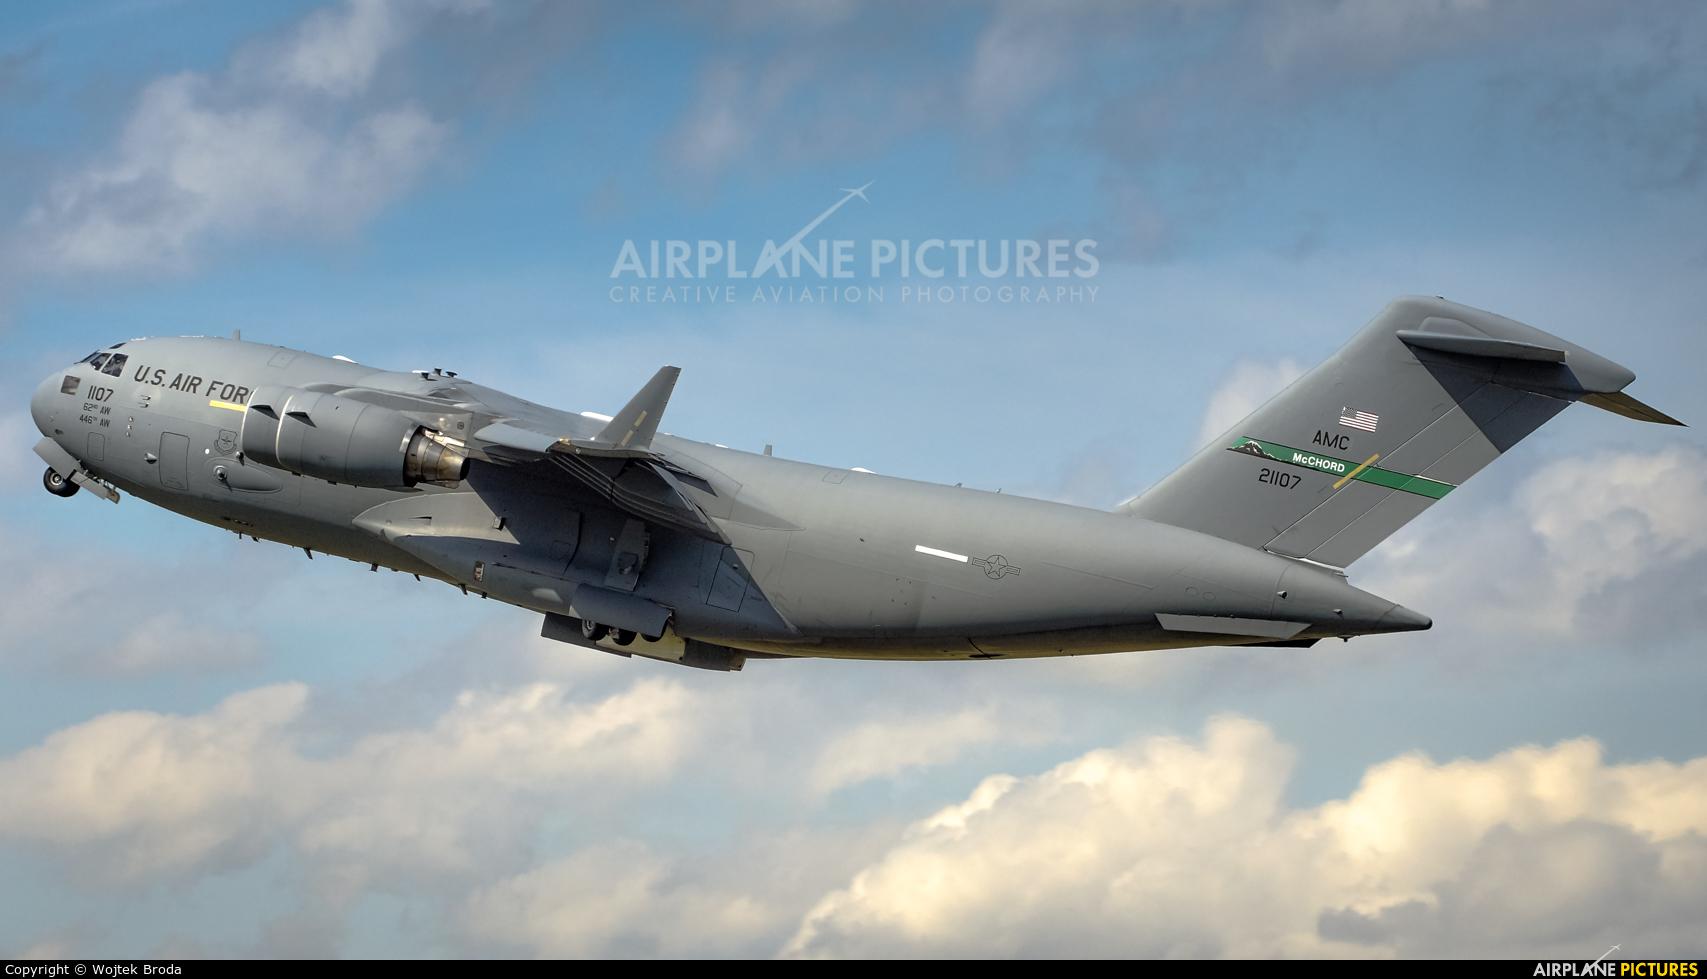 USA - Air Force 02-1107 aircraft at Wrocław - Copernicus